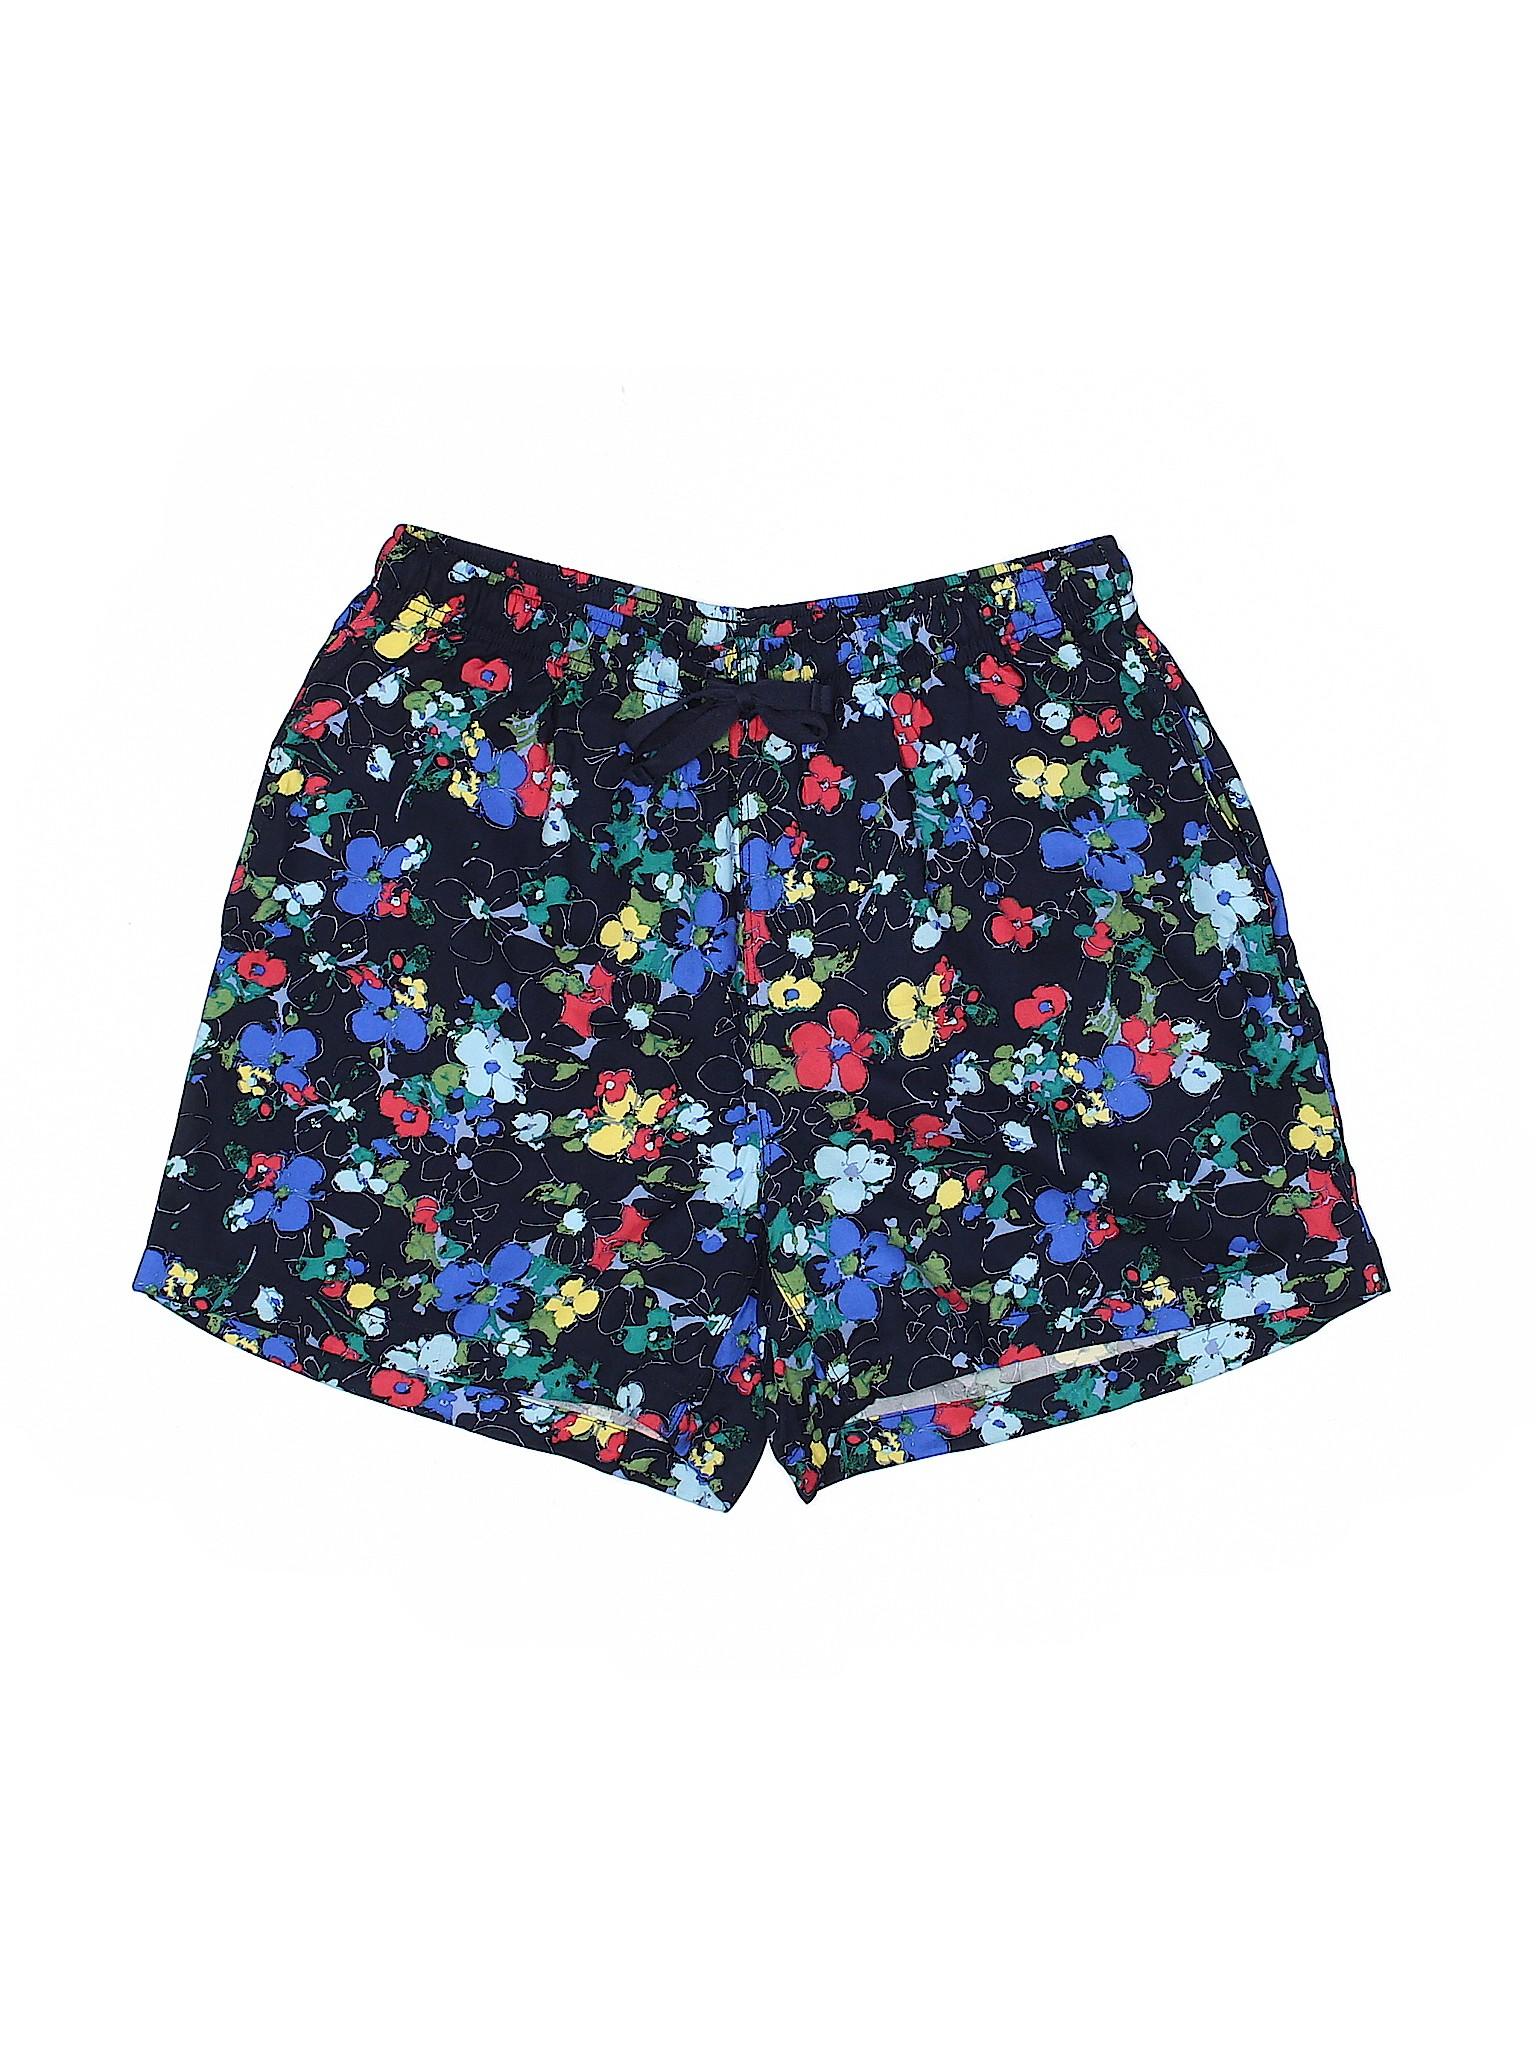 Uniqlo Boutique Boutique Shorts Uniqlo 6IvRwR